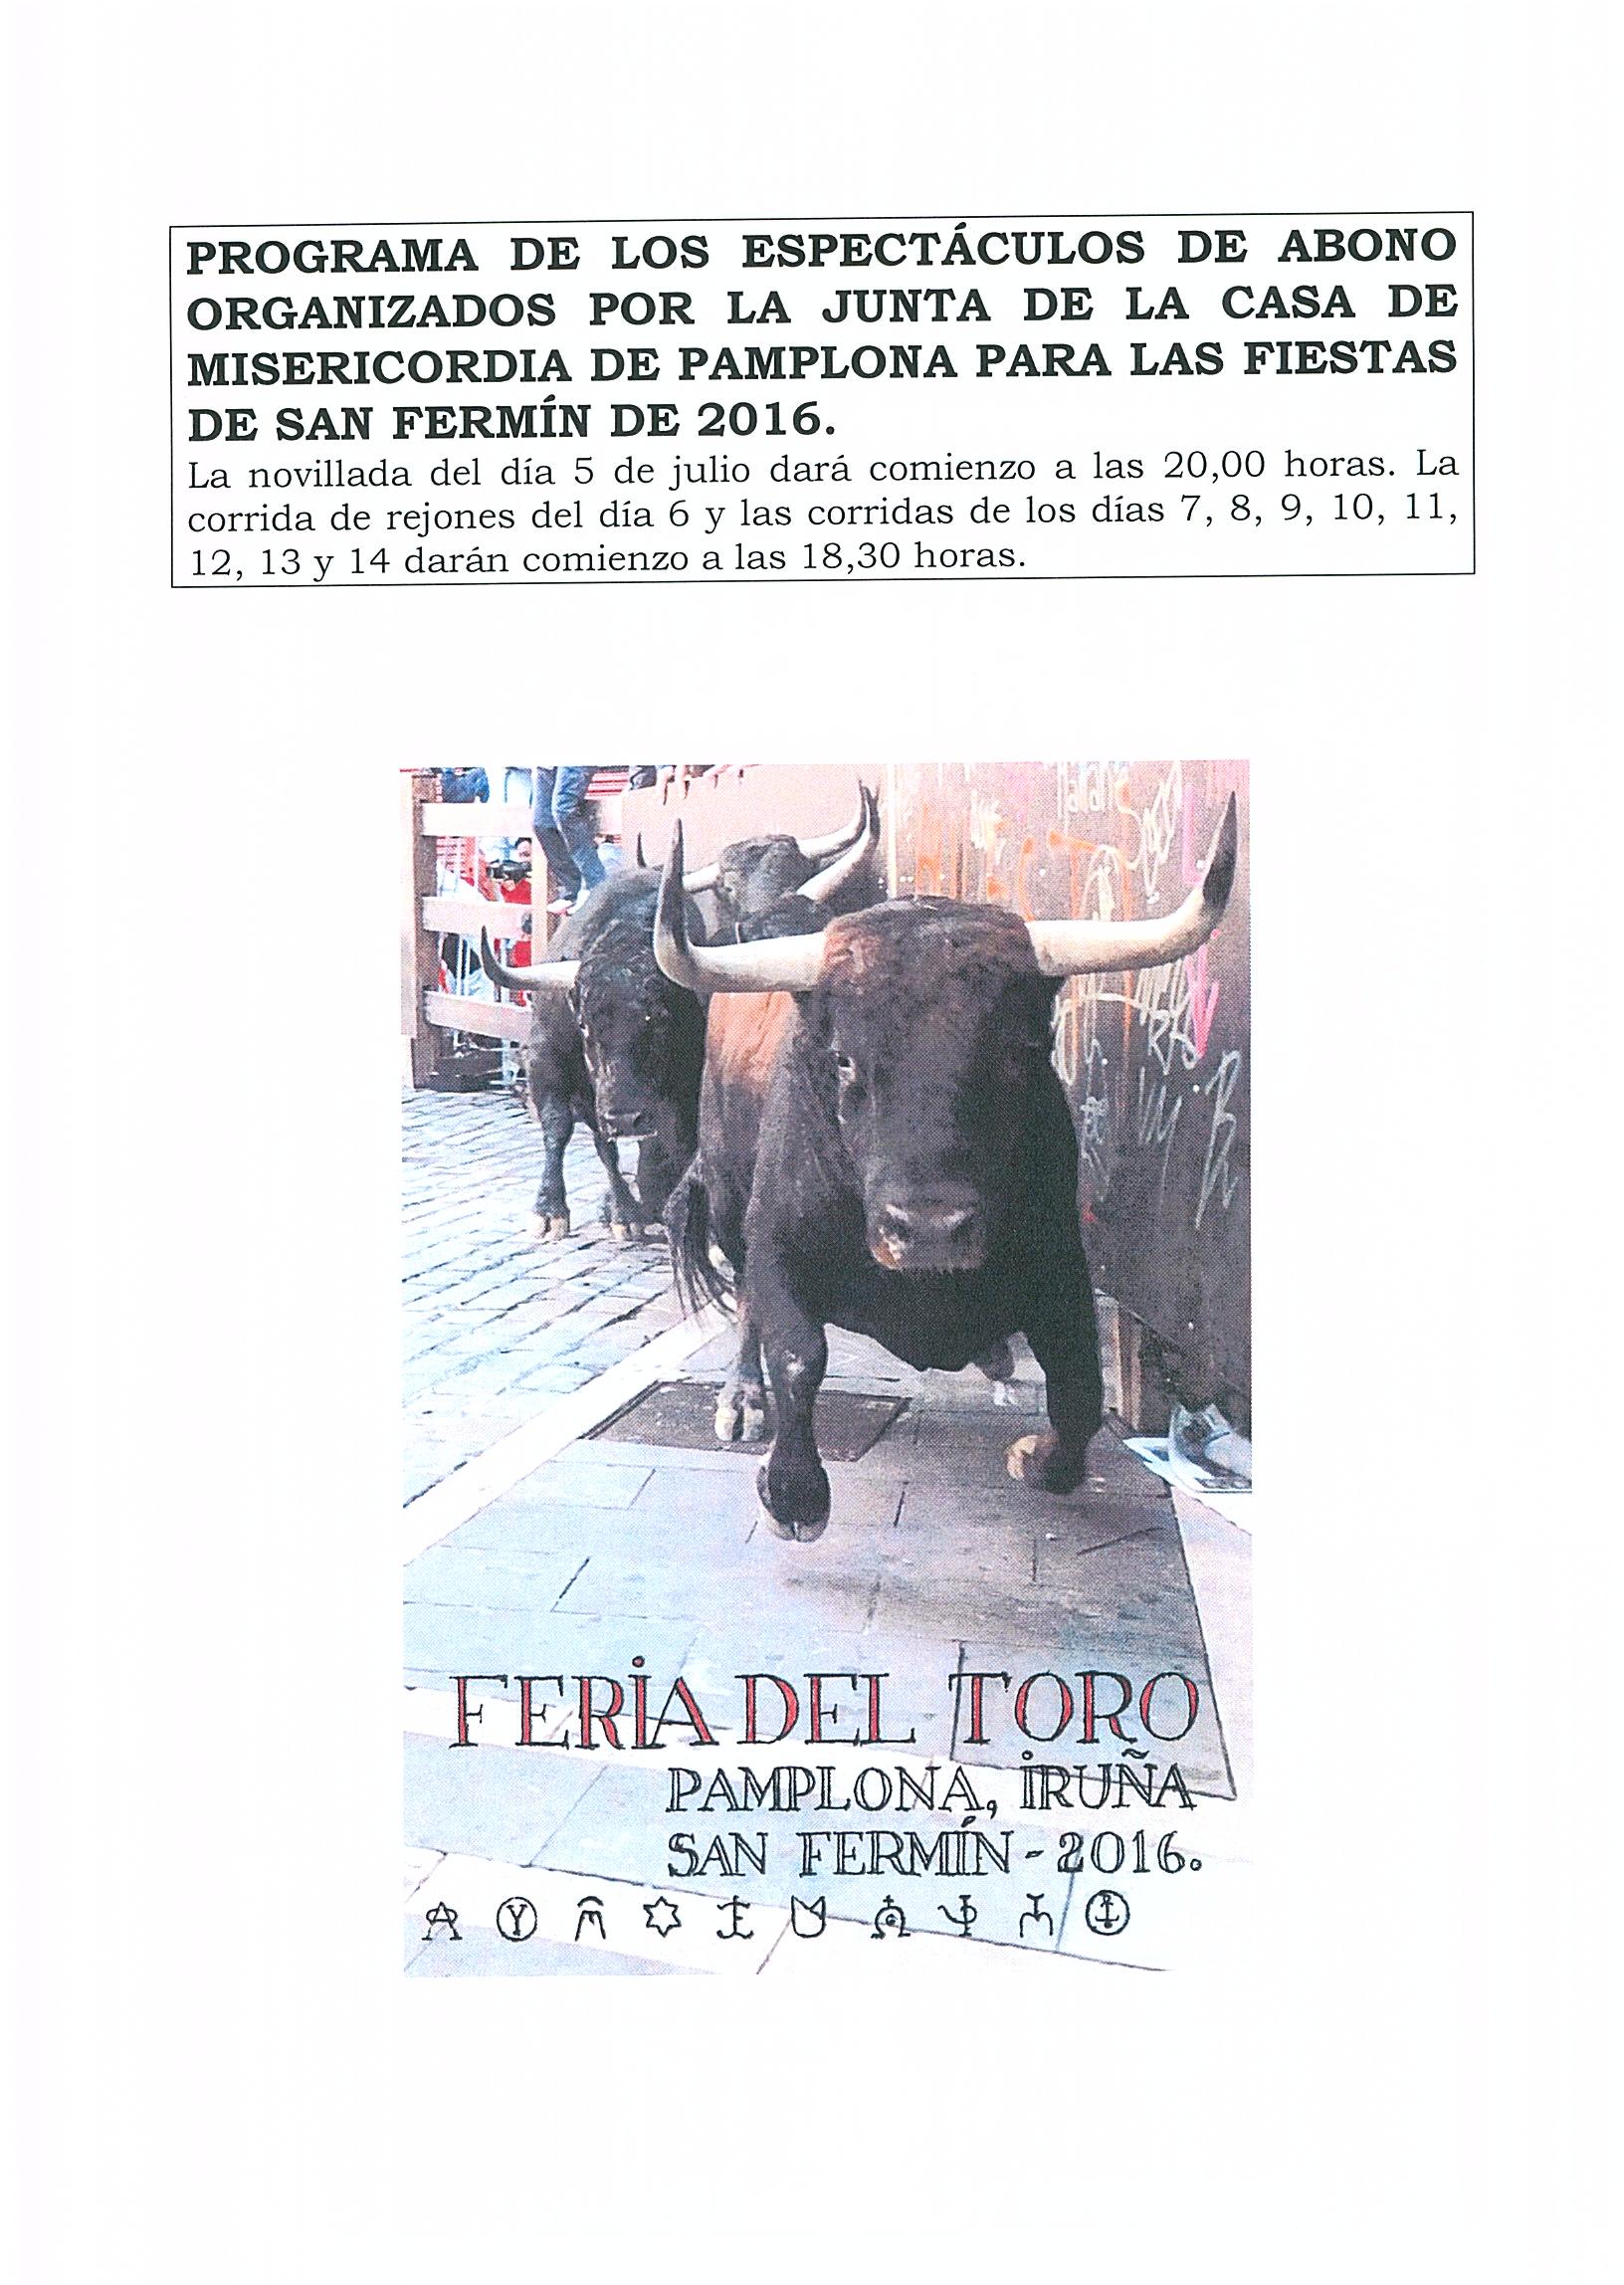 CARTEL FERIA DEL TORO SAN FERMIN 2016